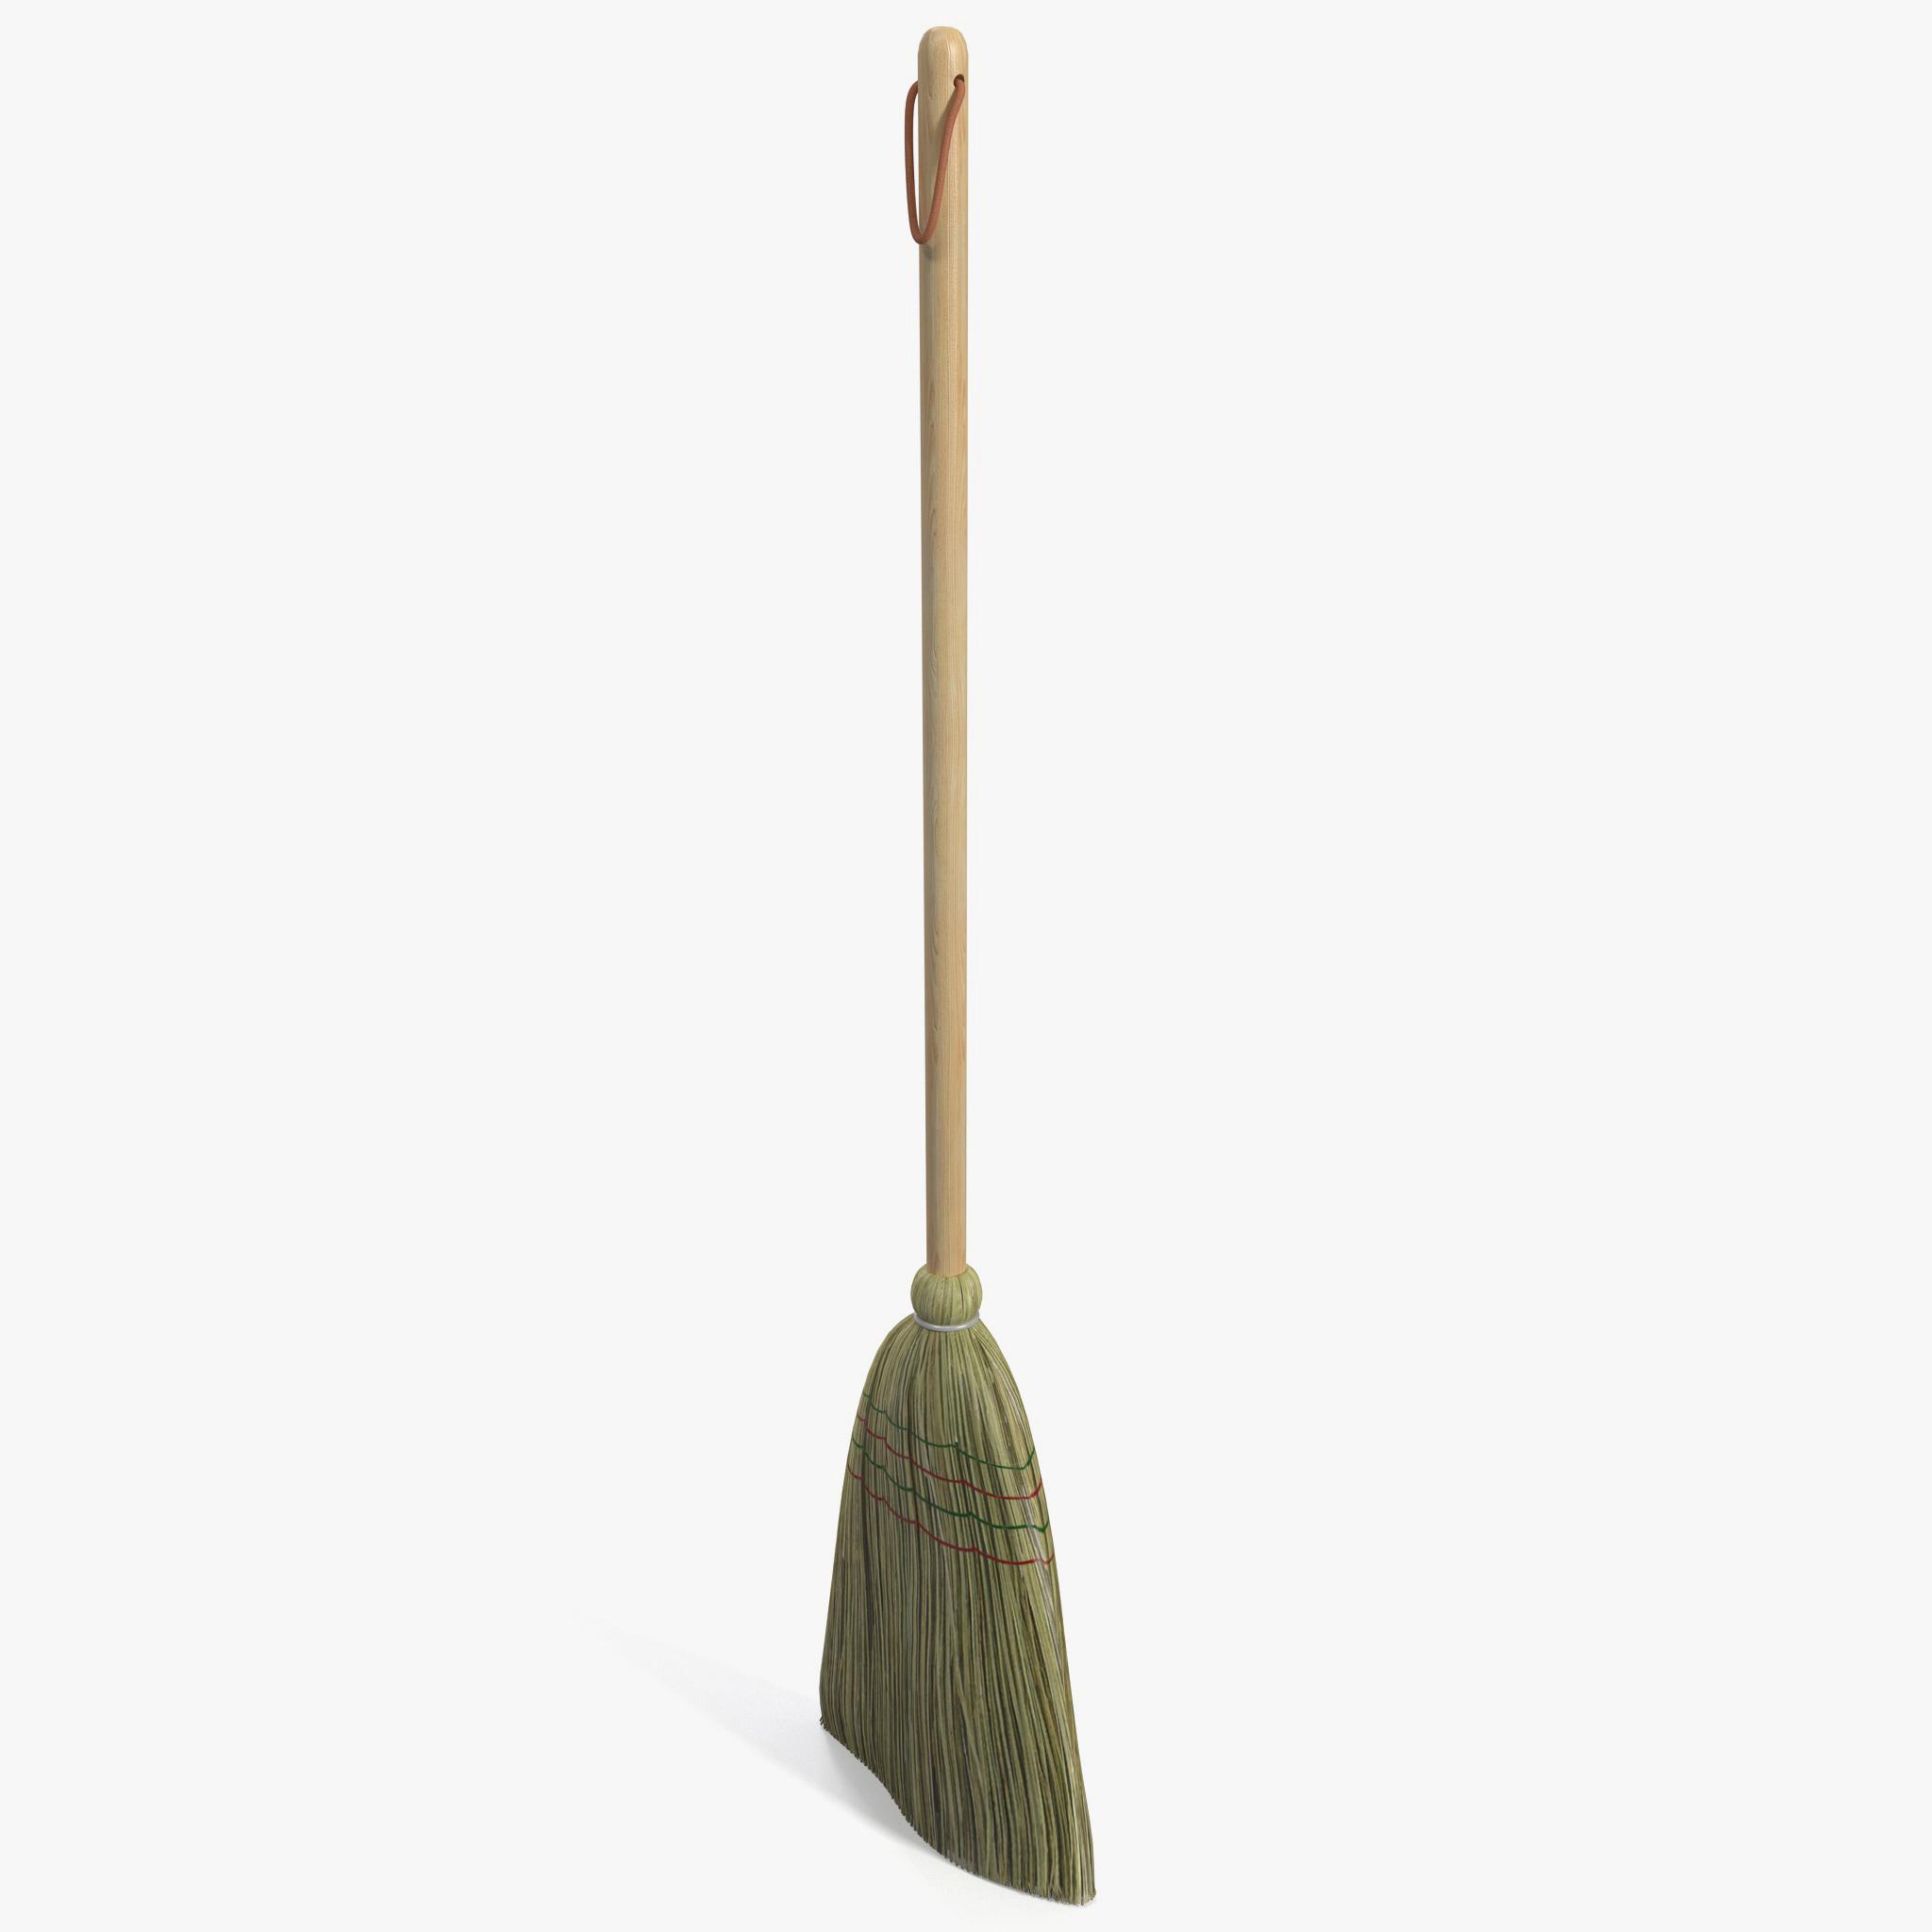 Broom_1.jpg